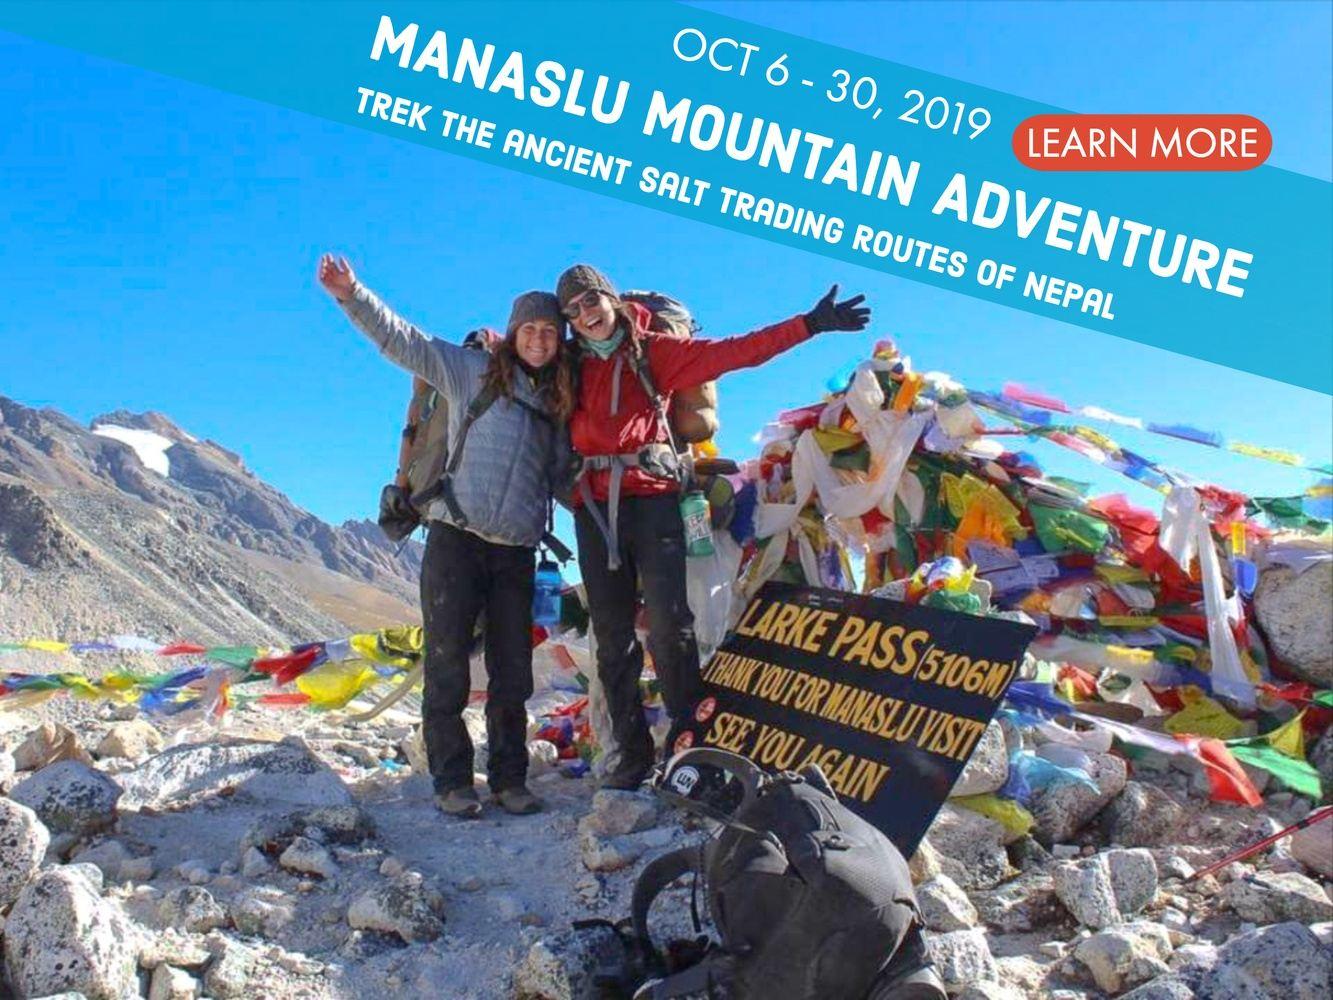 21 Day Manaslu Experience